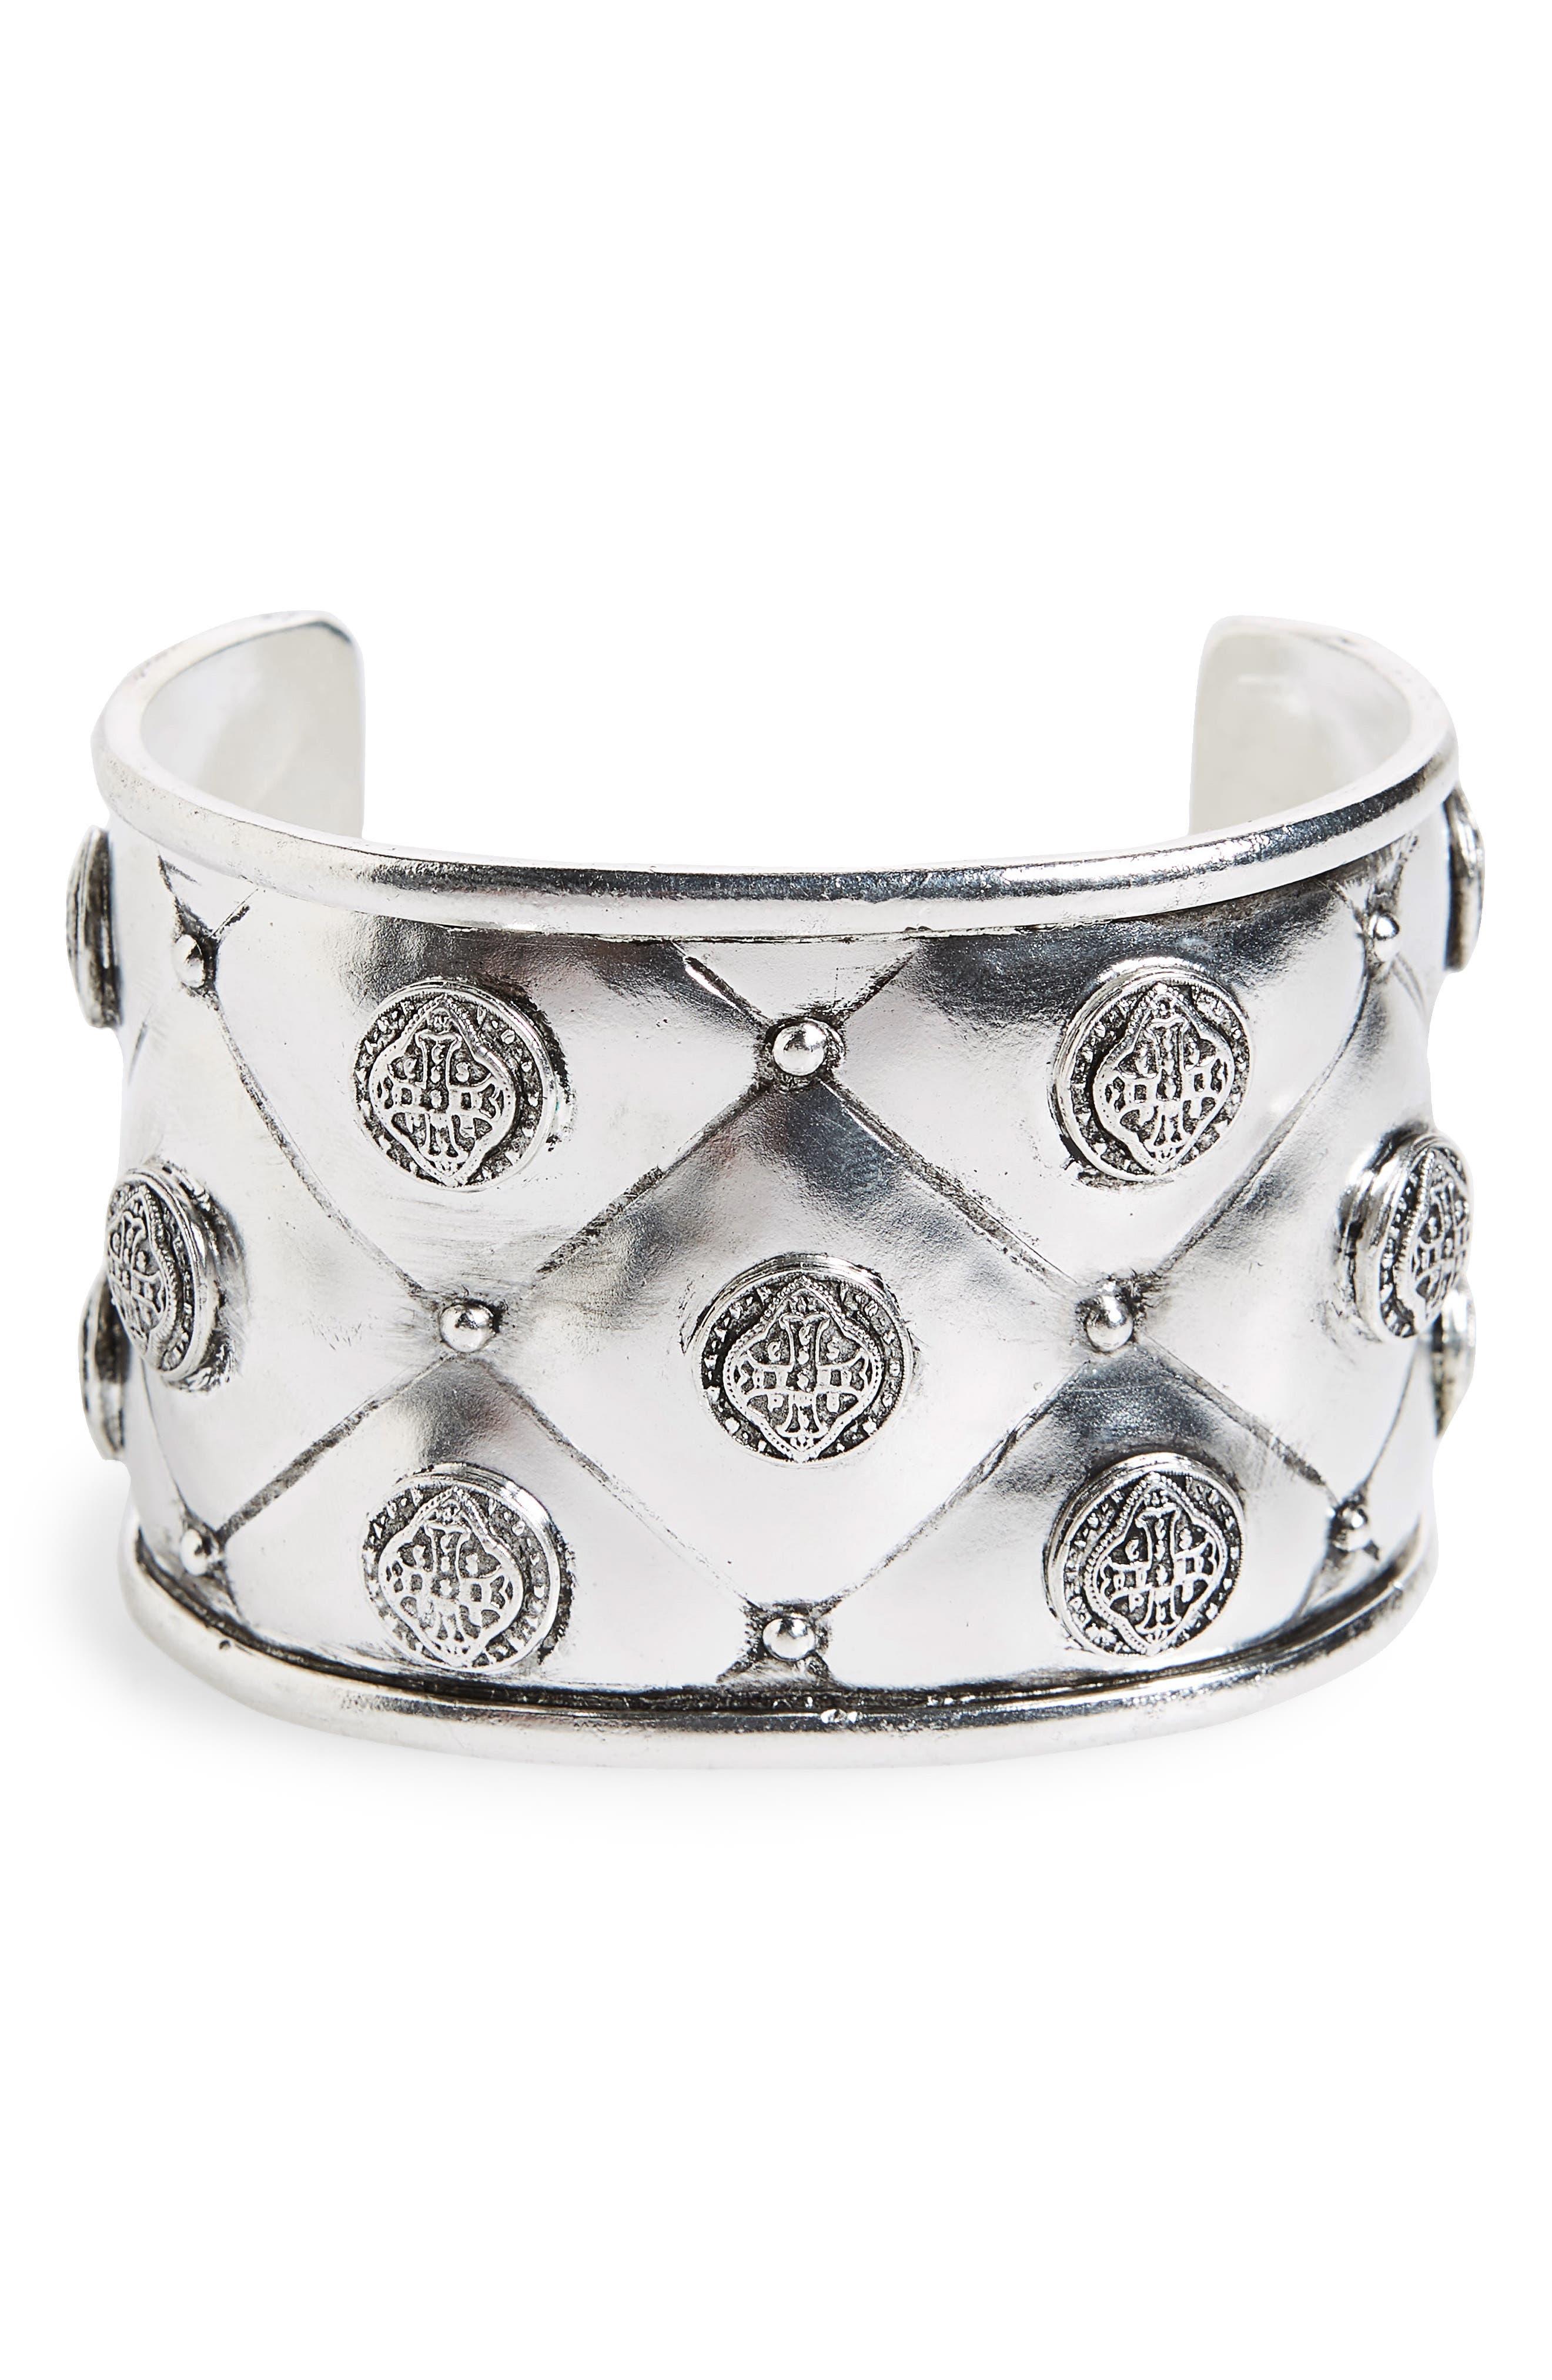 Sevilla Alba Cuff Bracelet,                             Main thumbnail 1, color,                             040